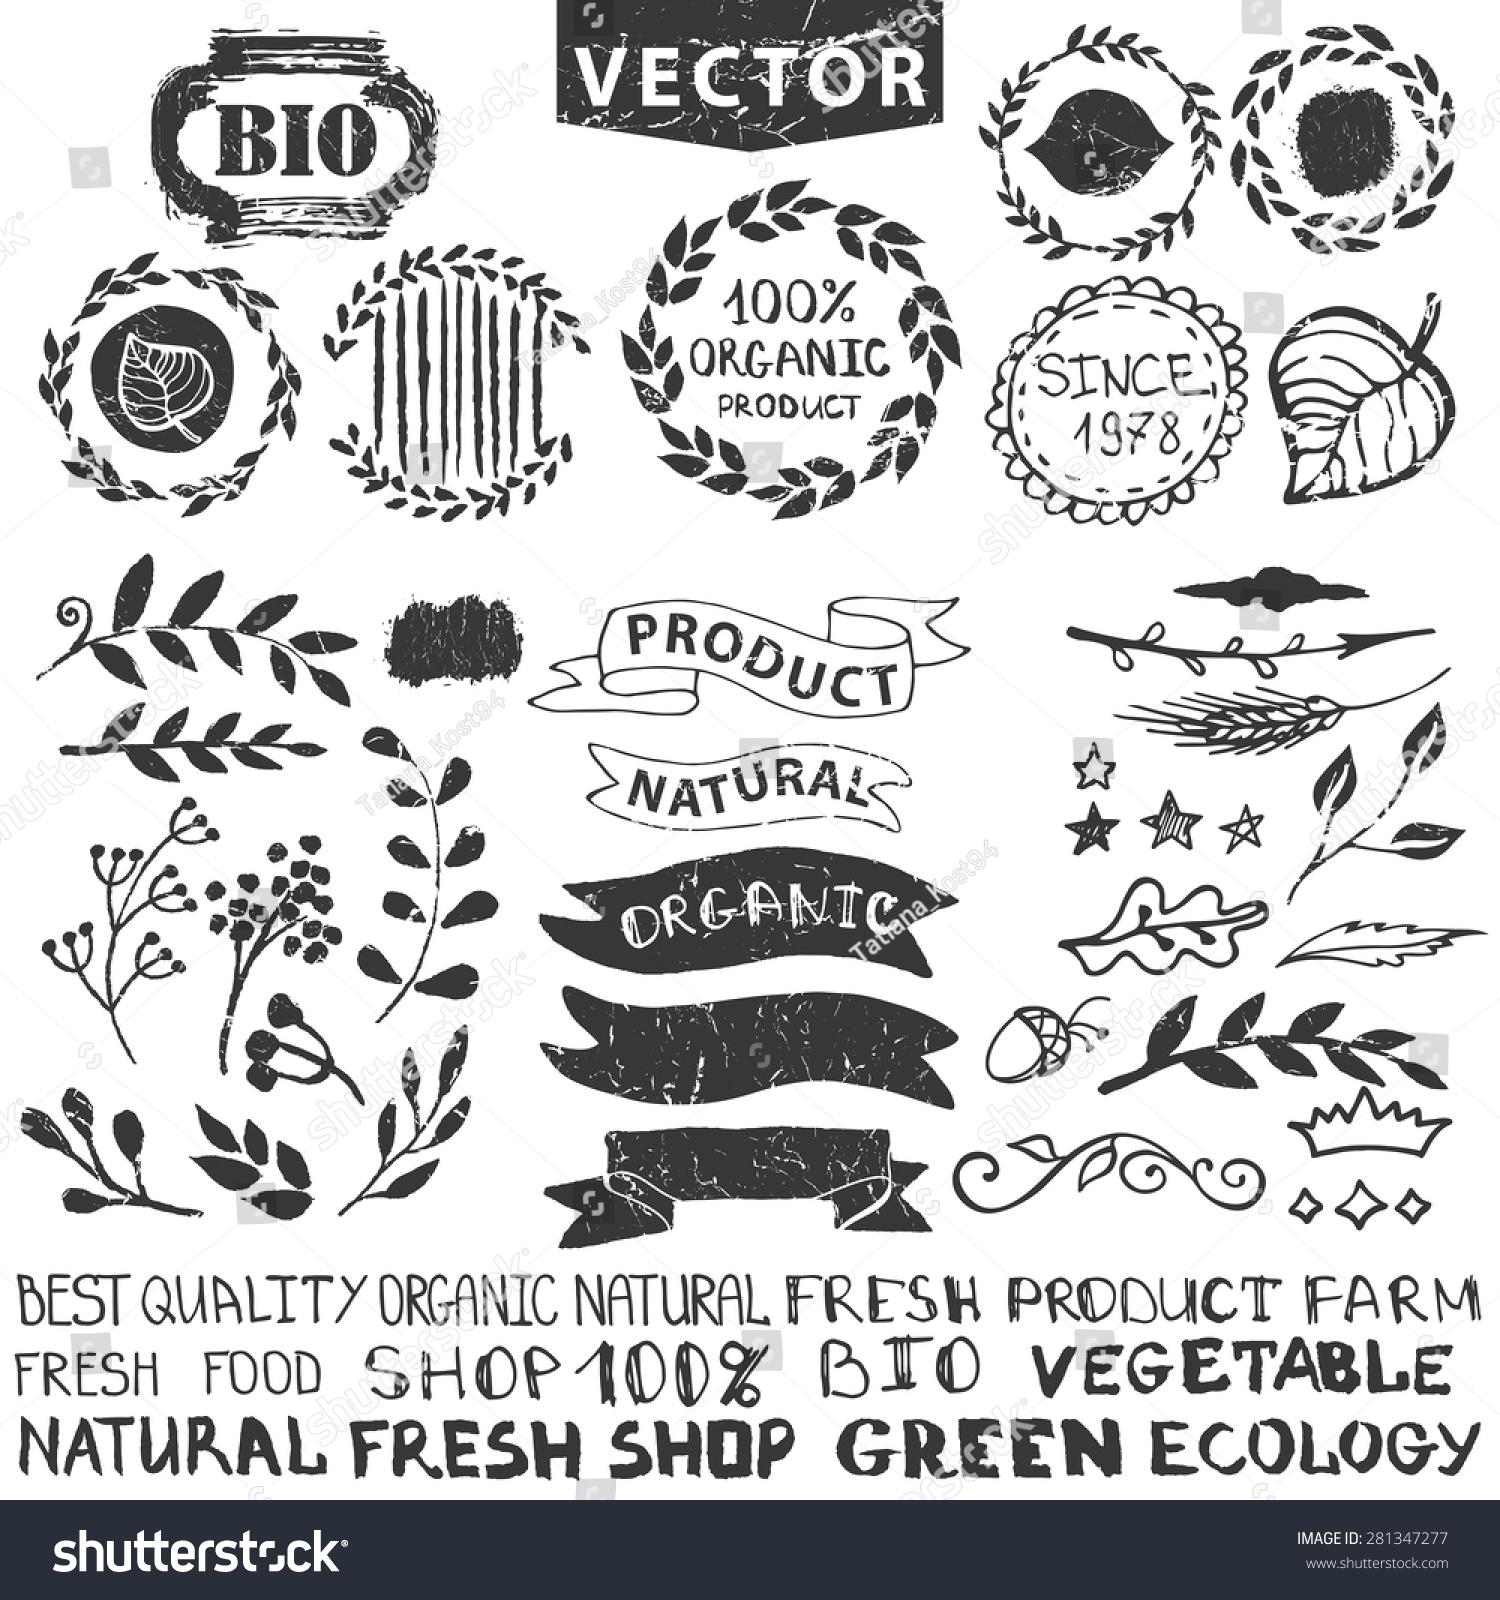 Badgeslabelsfloral Elementswreaths And LaurelsOrganicnatural Design Hand Drawing Vintage Silhouette Vectorink SketchLogotype Makerlettering